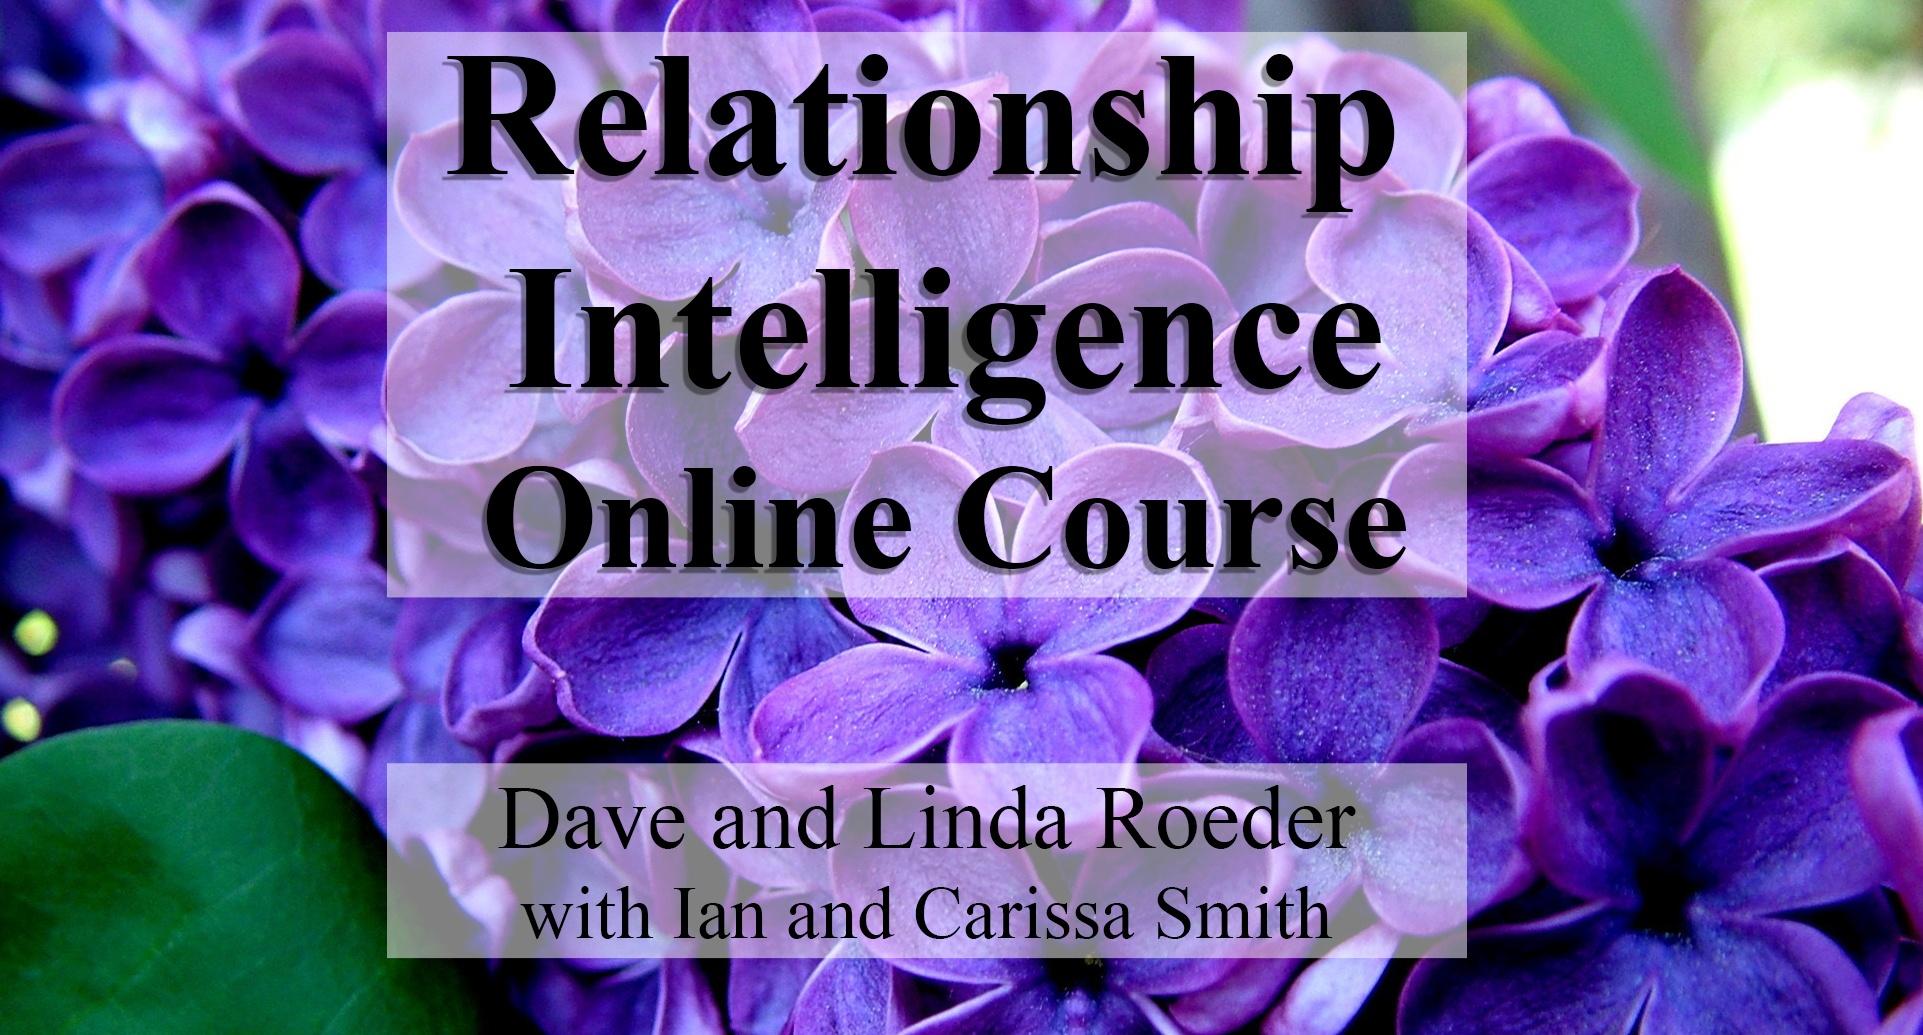 Relationship Intelligence Online Course